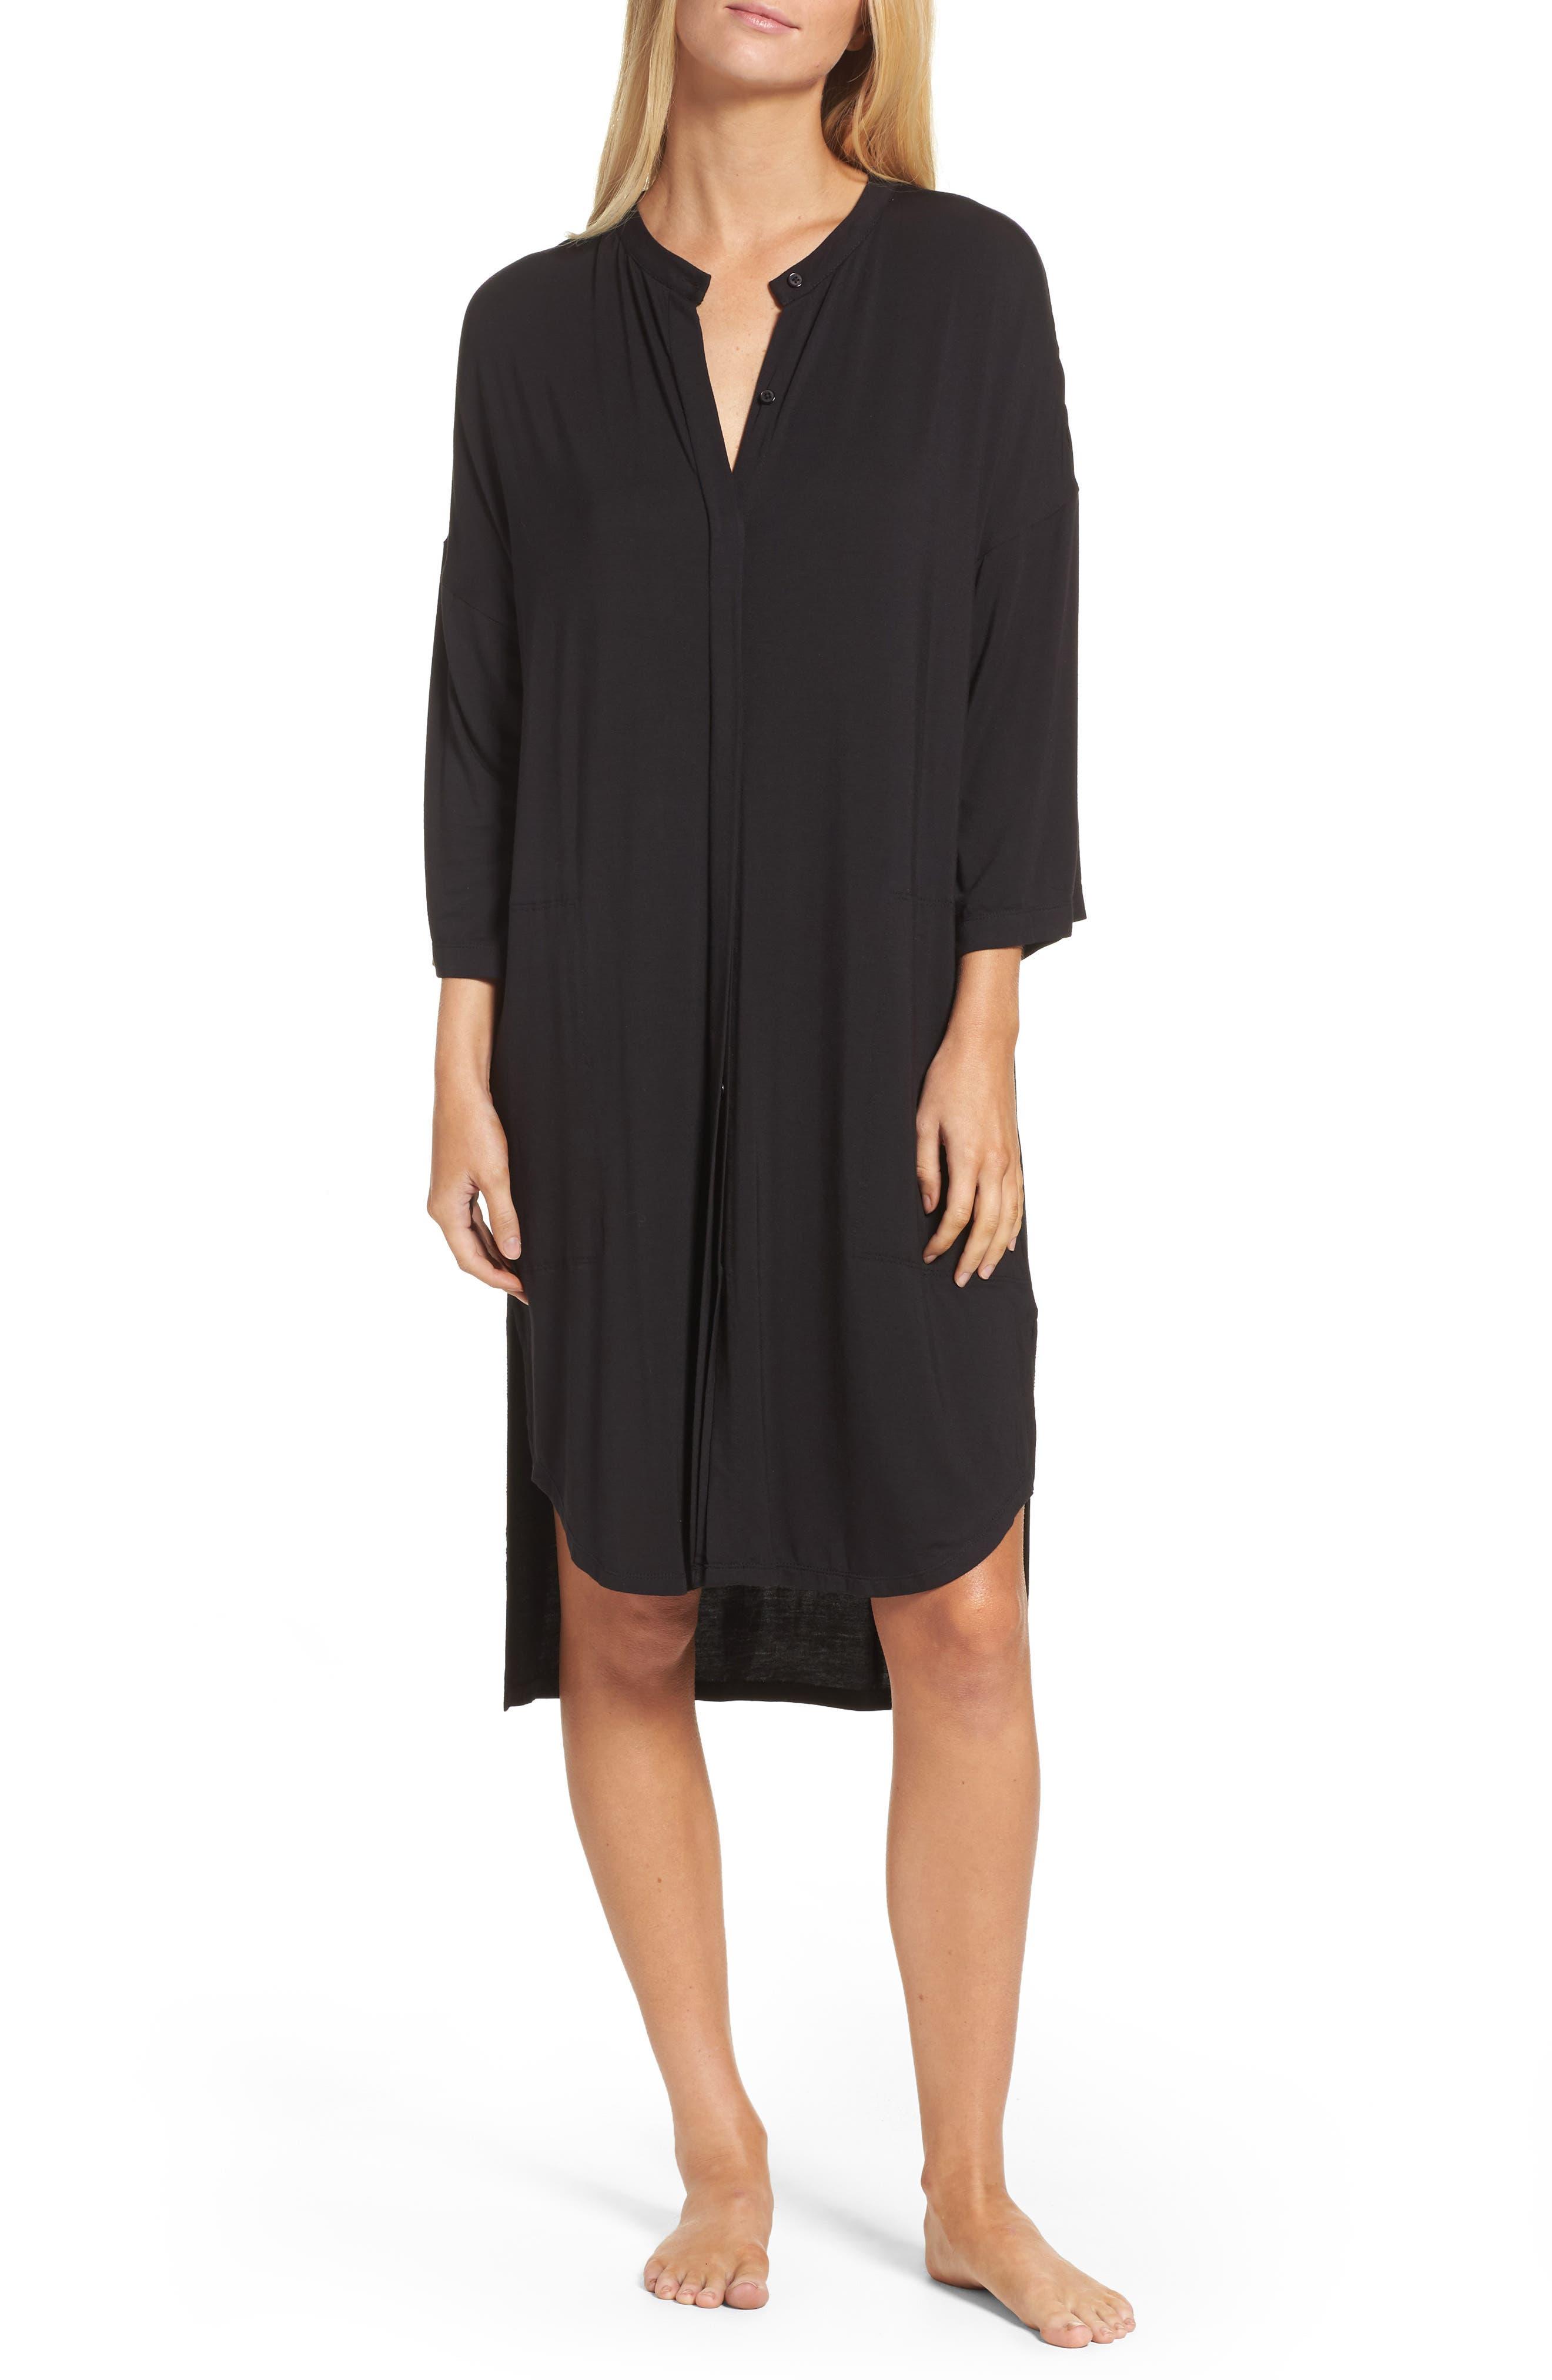 DKNY Knit Sleep Shirt